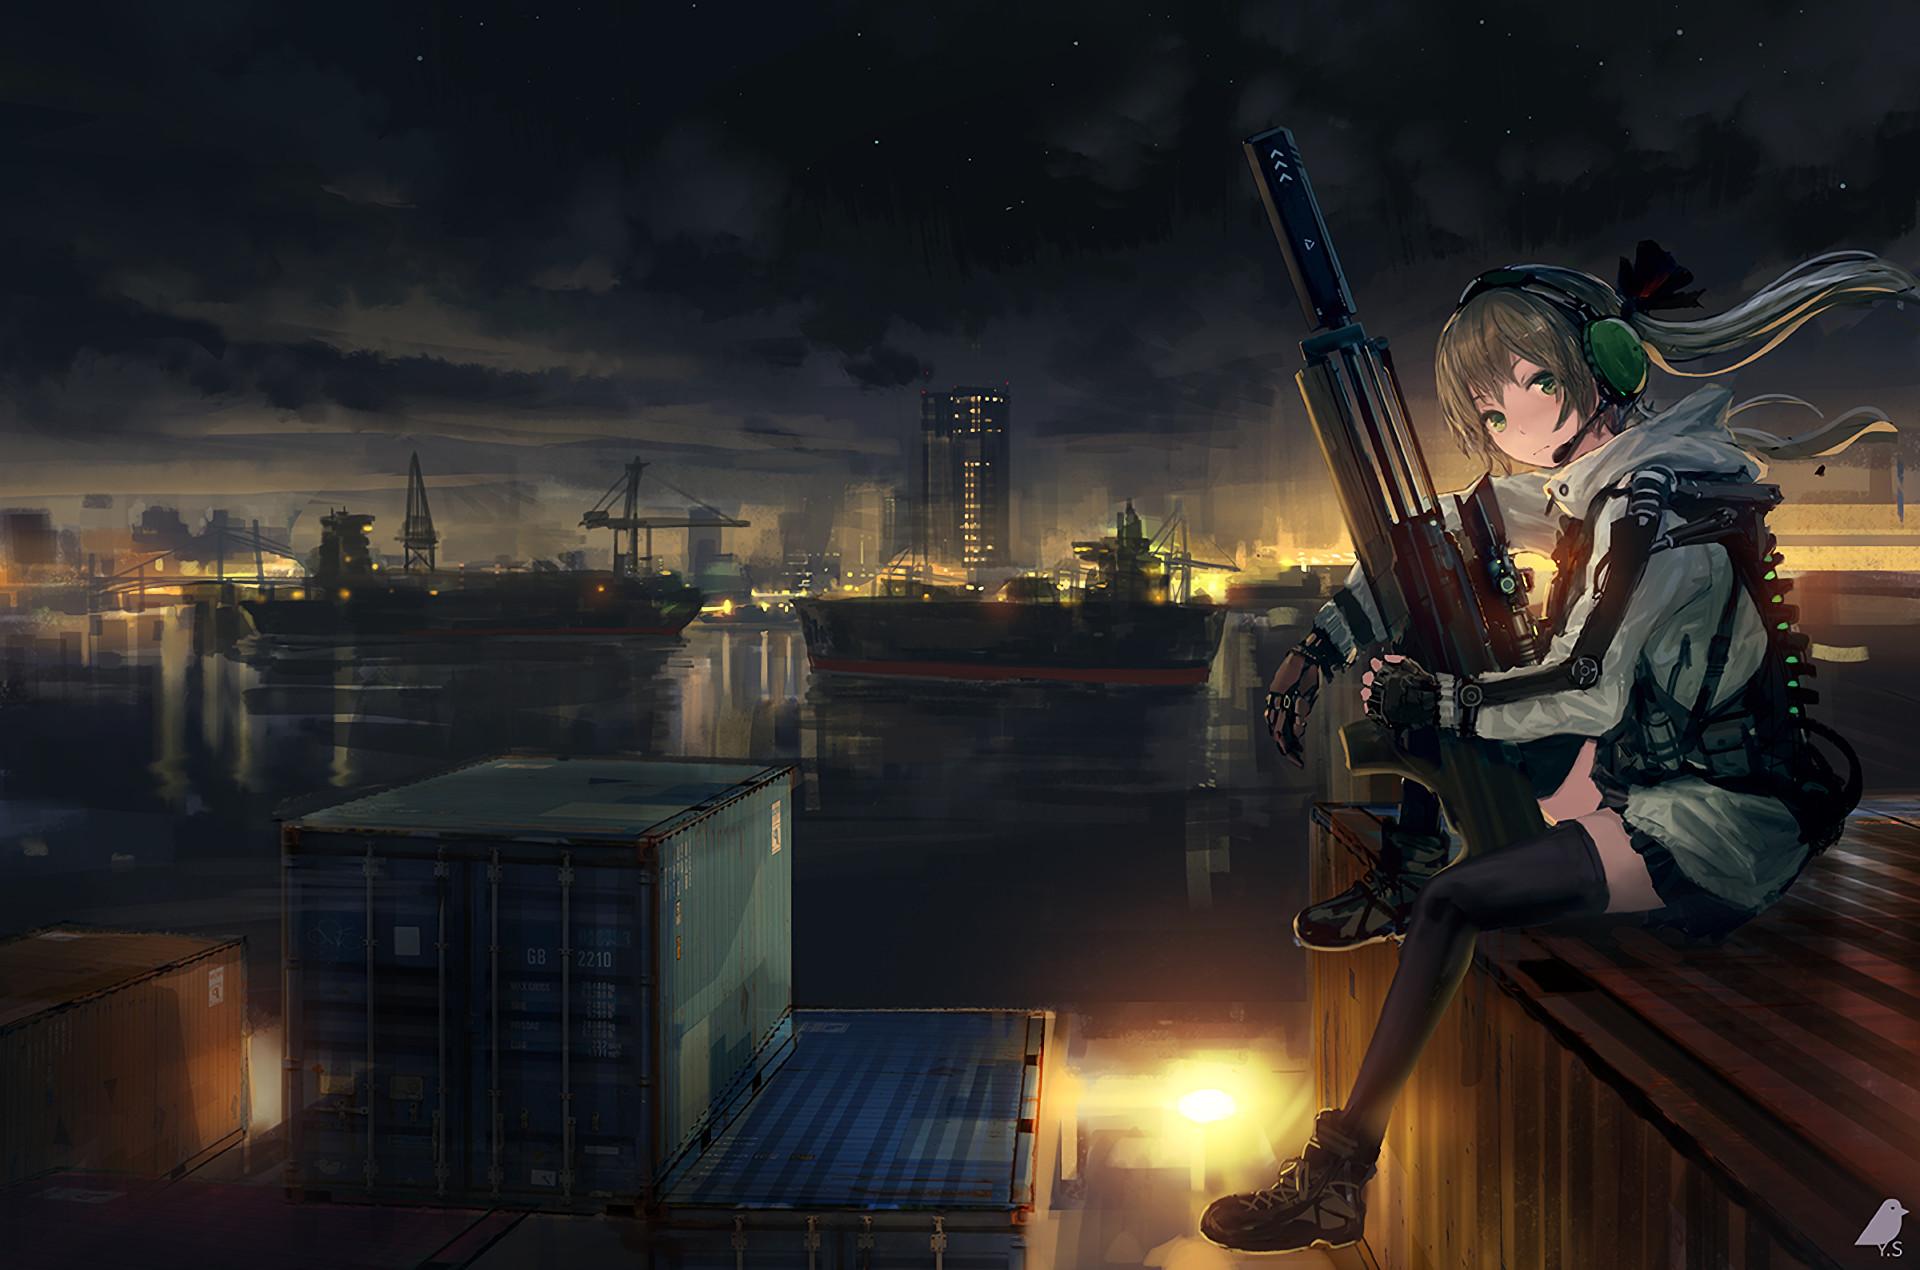 – anime girl, soldier, sitting, sniper, artwork # original  resolution